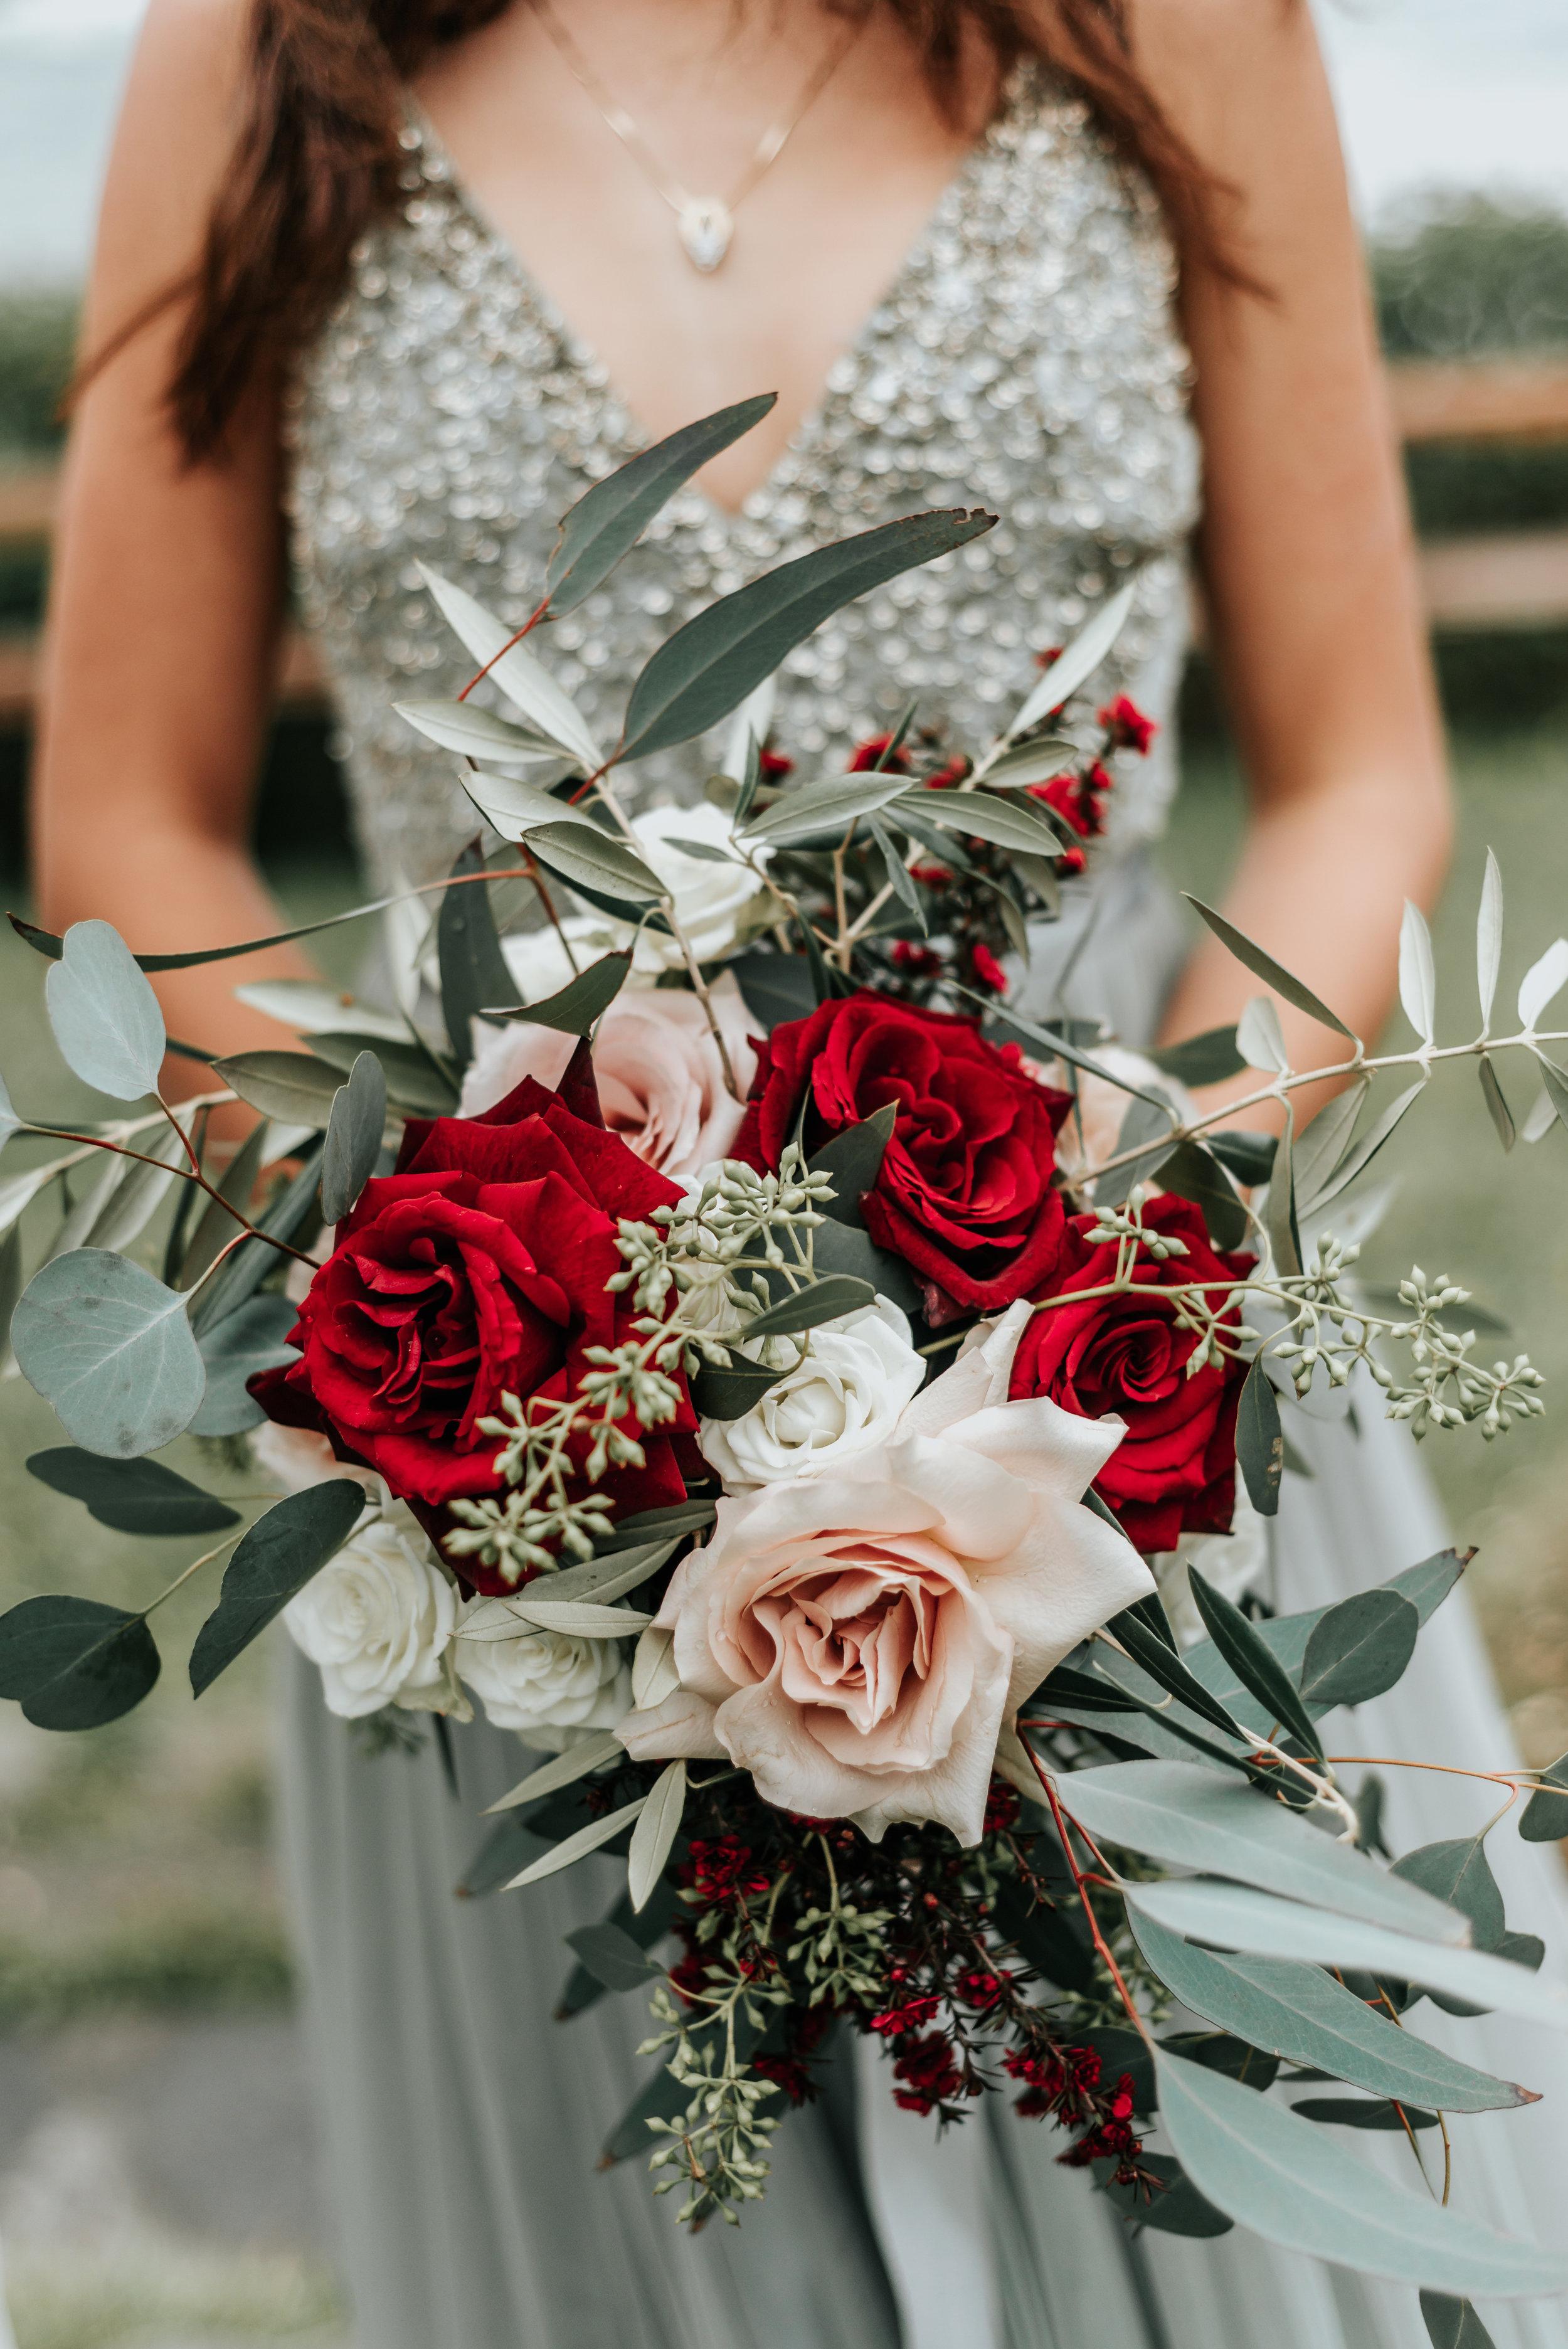 Albion River Inn Wedding in Albion Caliornia-34.jpg